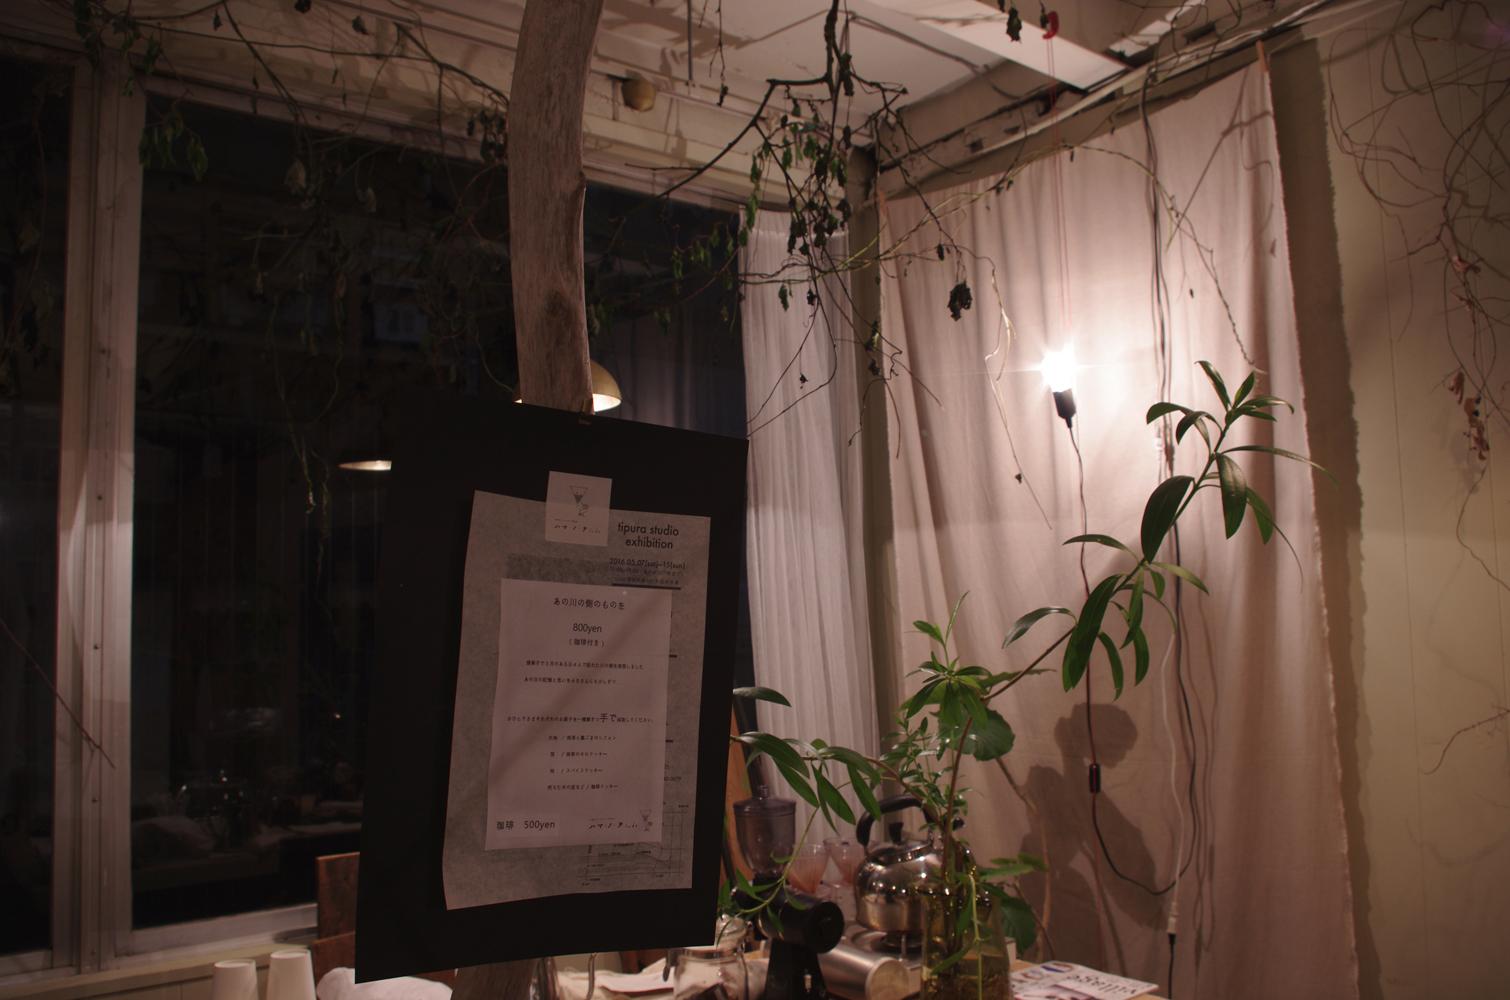 tipura-studio-ironworks-exhibition-5